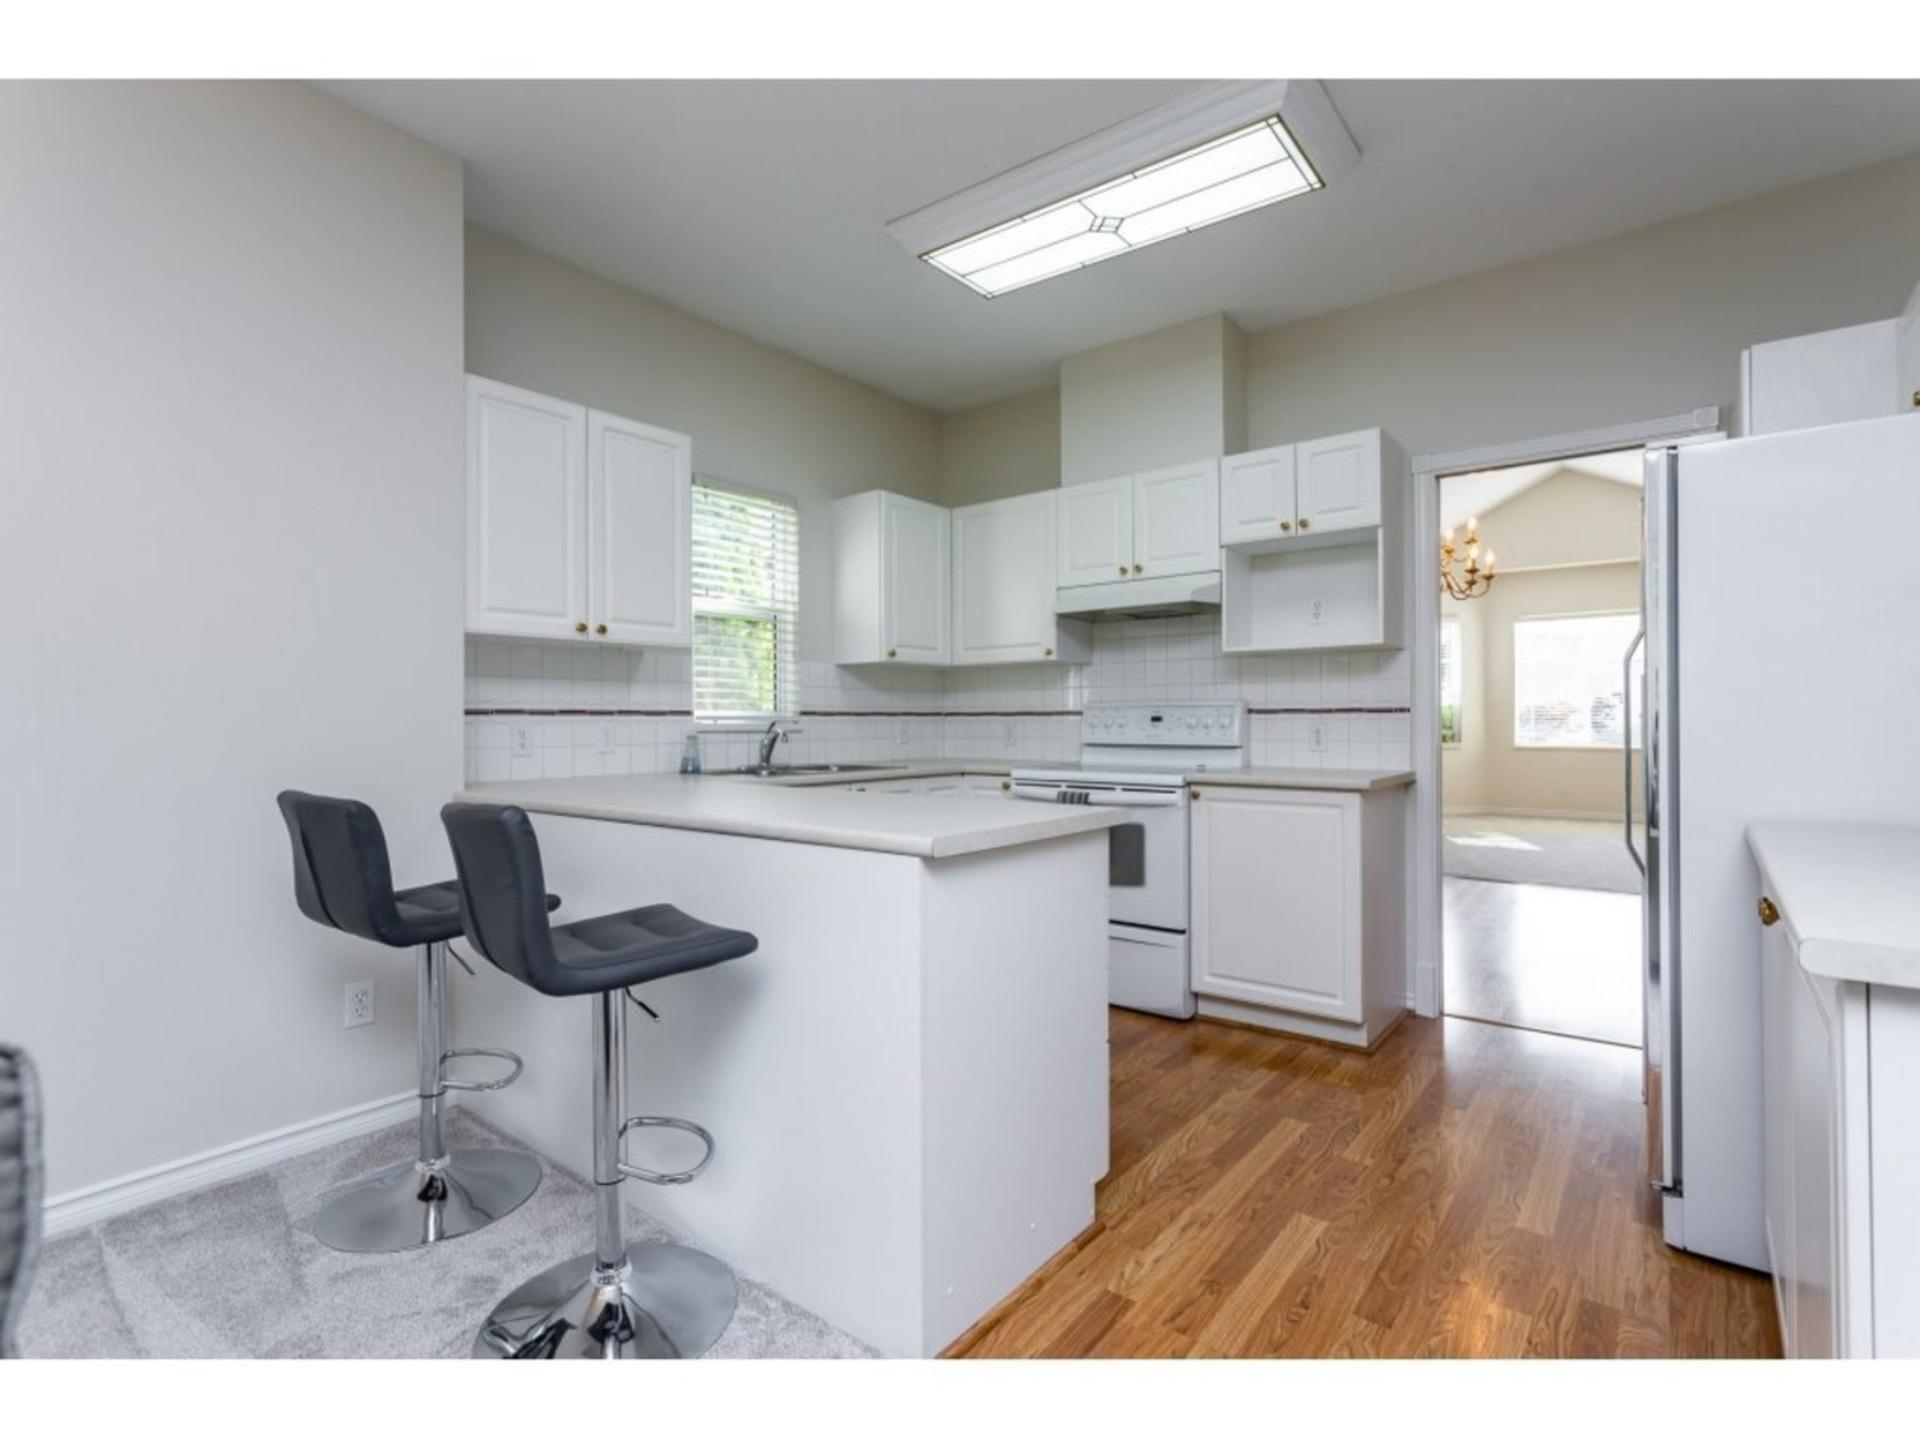 20655-88-avenue-walnut-grove-langley-06 at 330 - 20655 88 Avenue, Walnut Grove, Langley